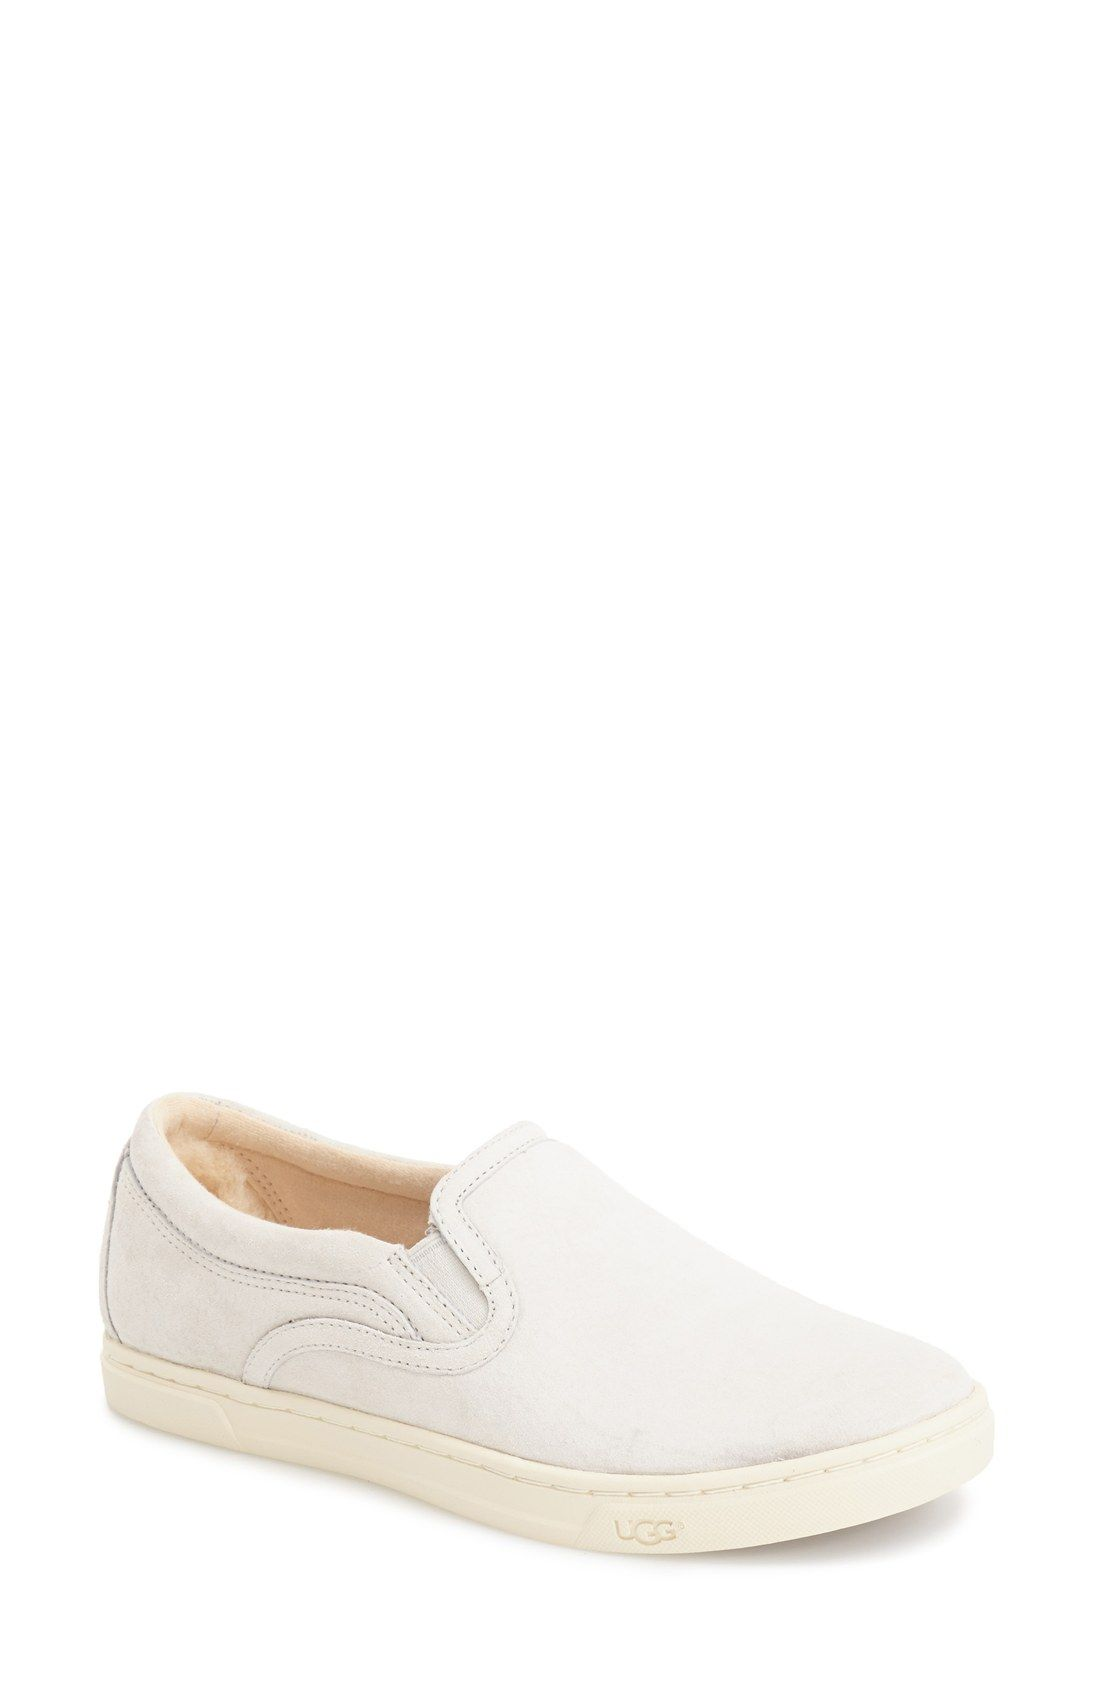 UGG® Australia 'Fierce' Water Resistant Suede Slip-On Sneaker (Nordstrom Exclusive